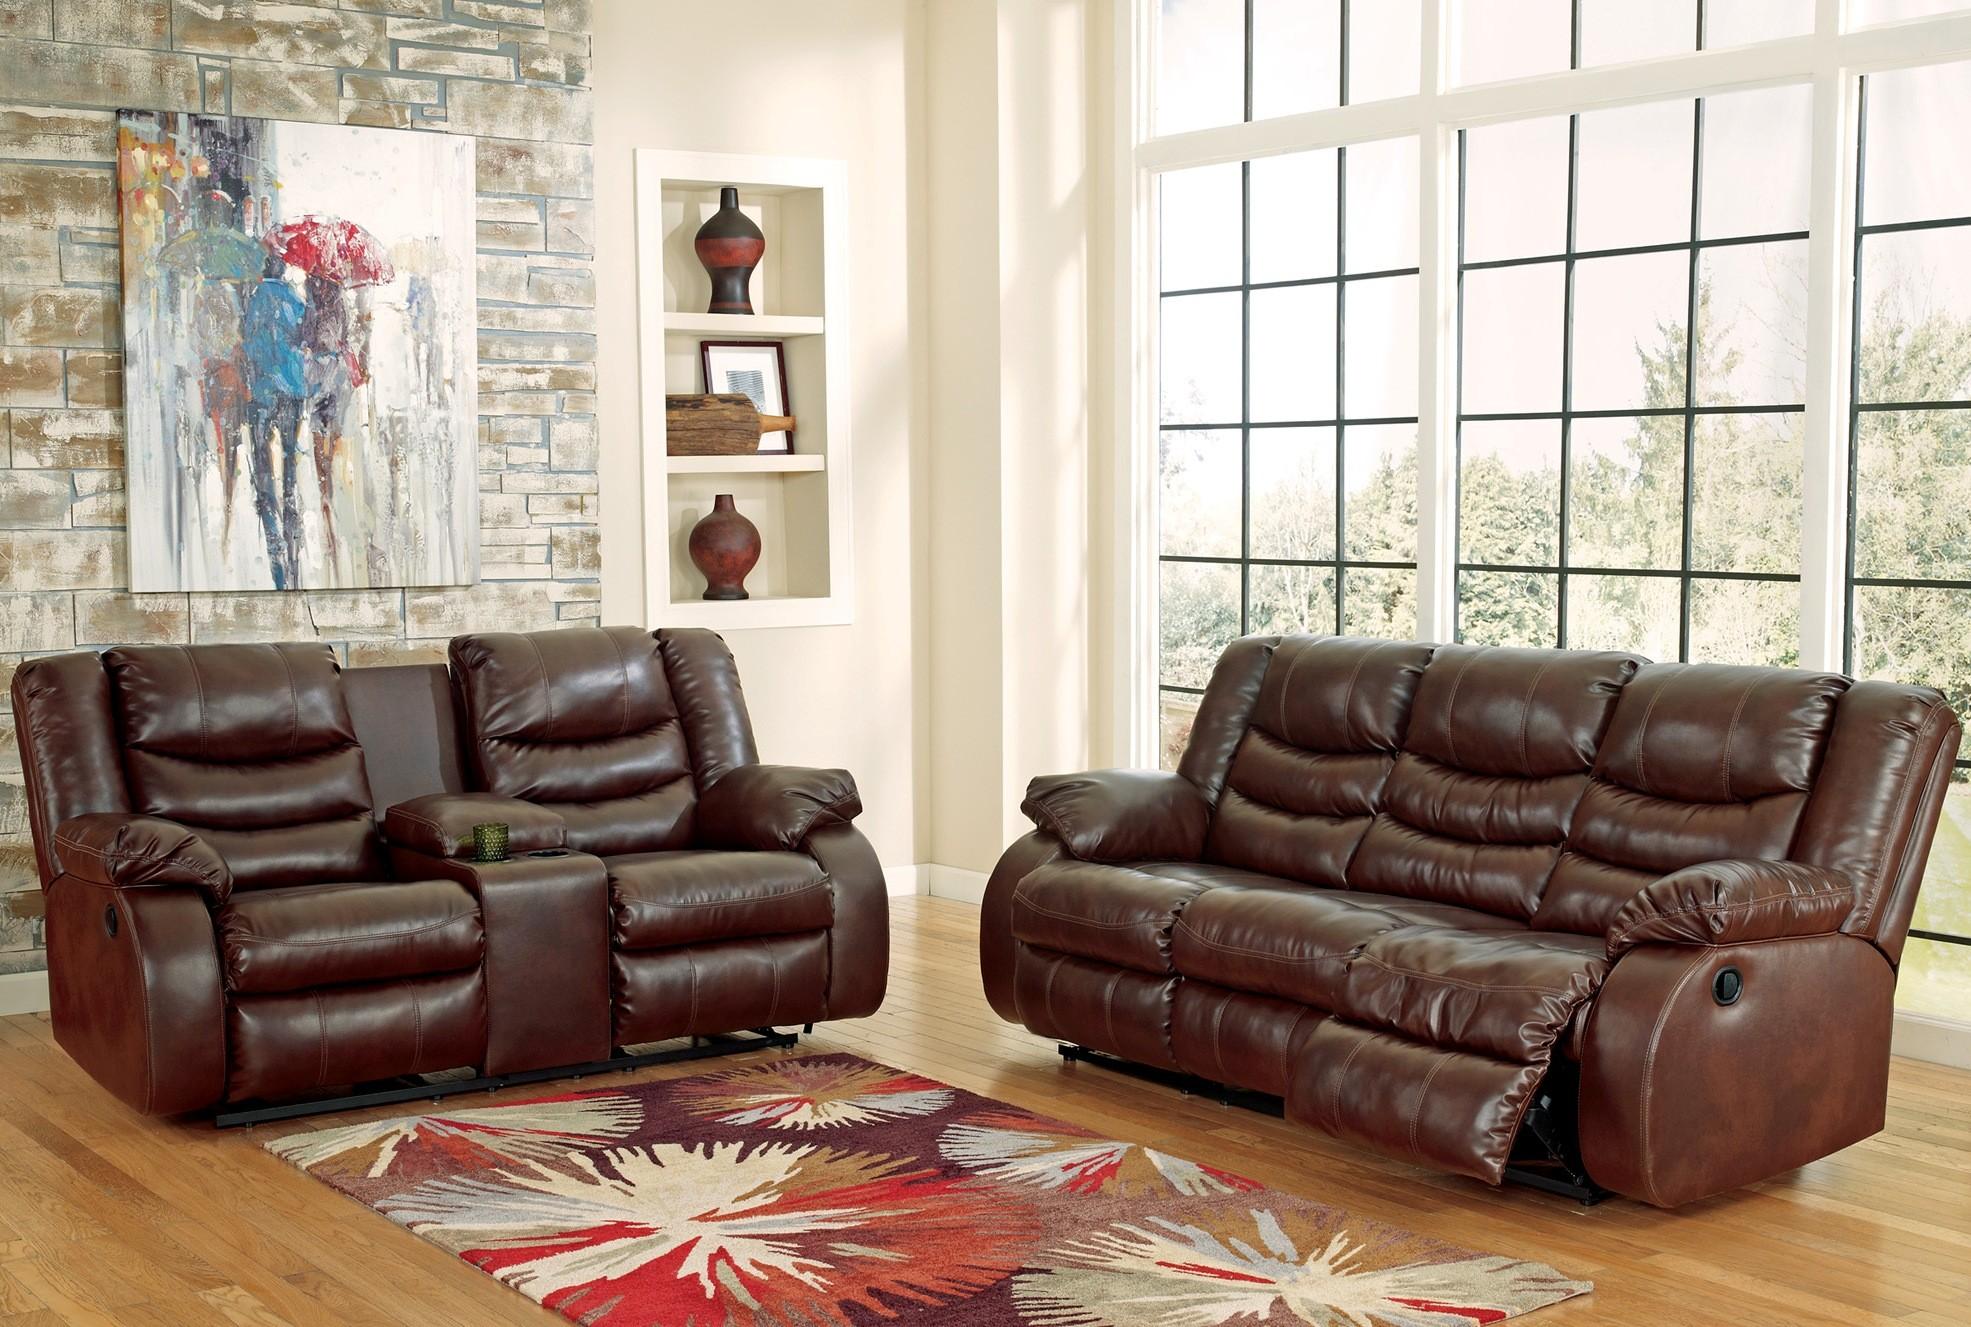 Linebacker DuraBlend Espresso Reclining Living Room Set from Ashley ...